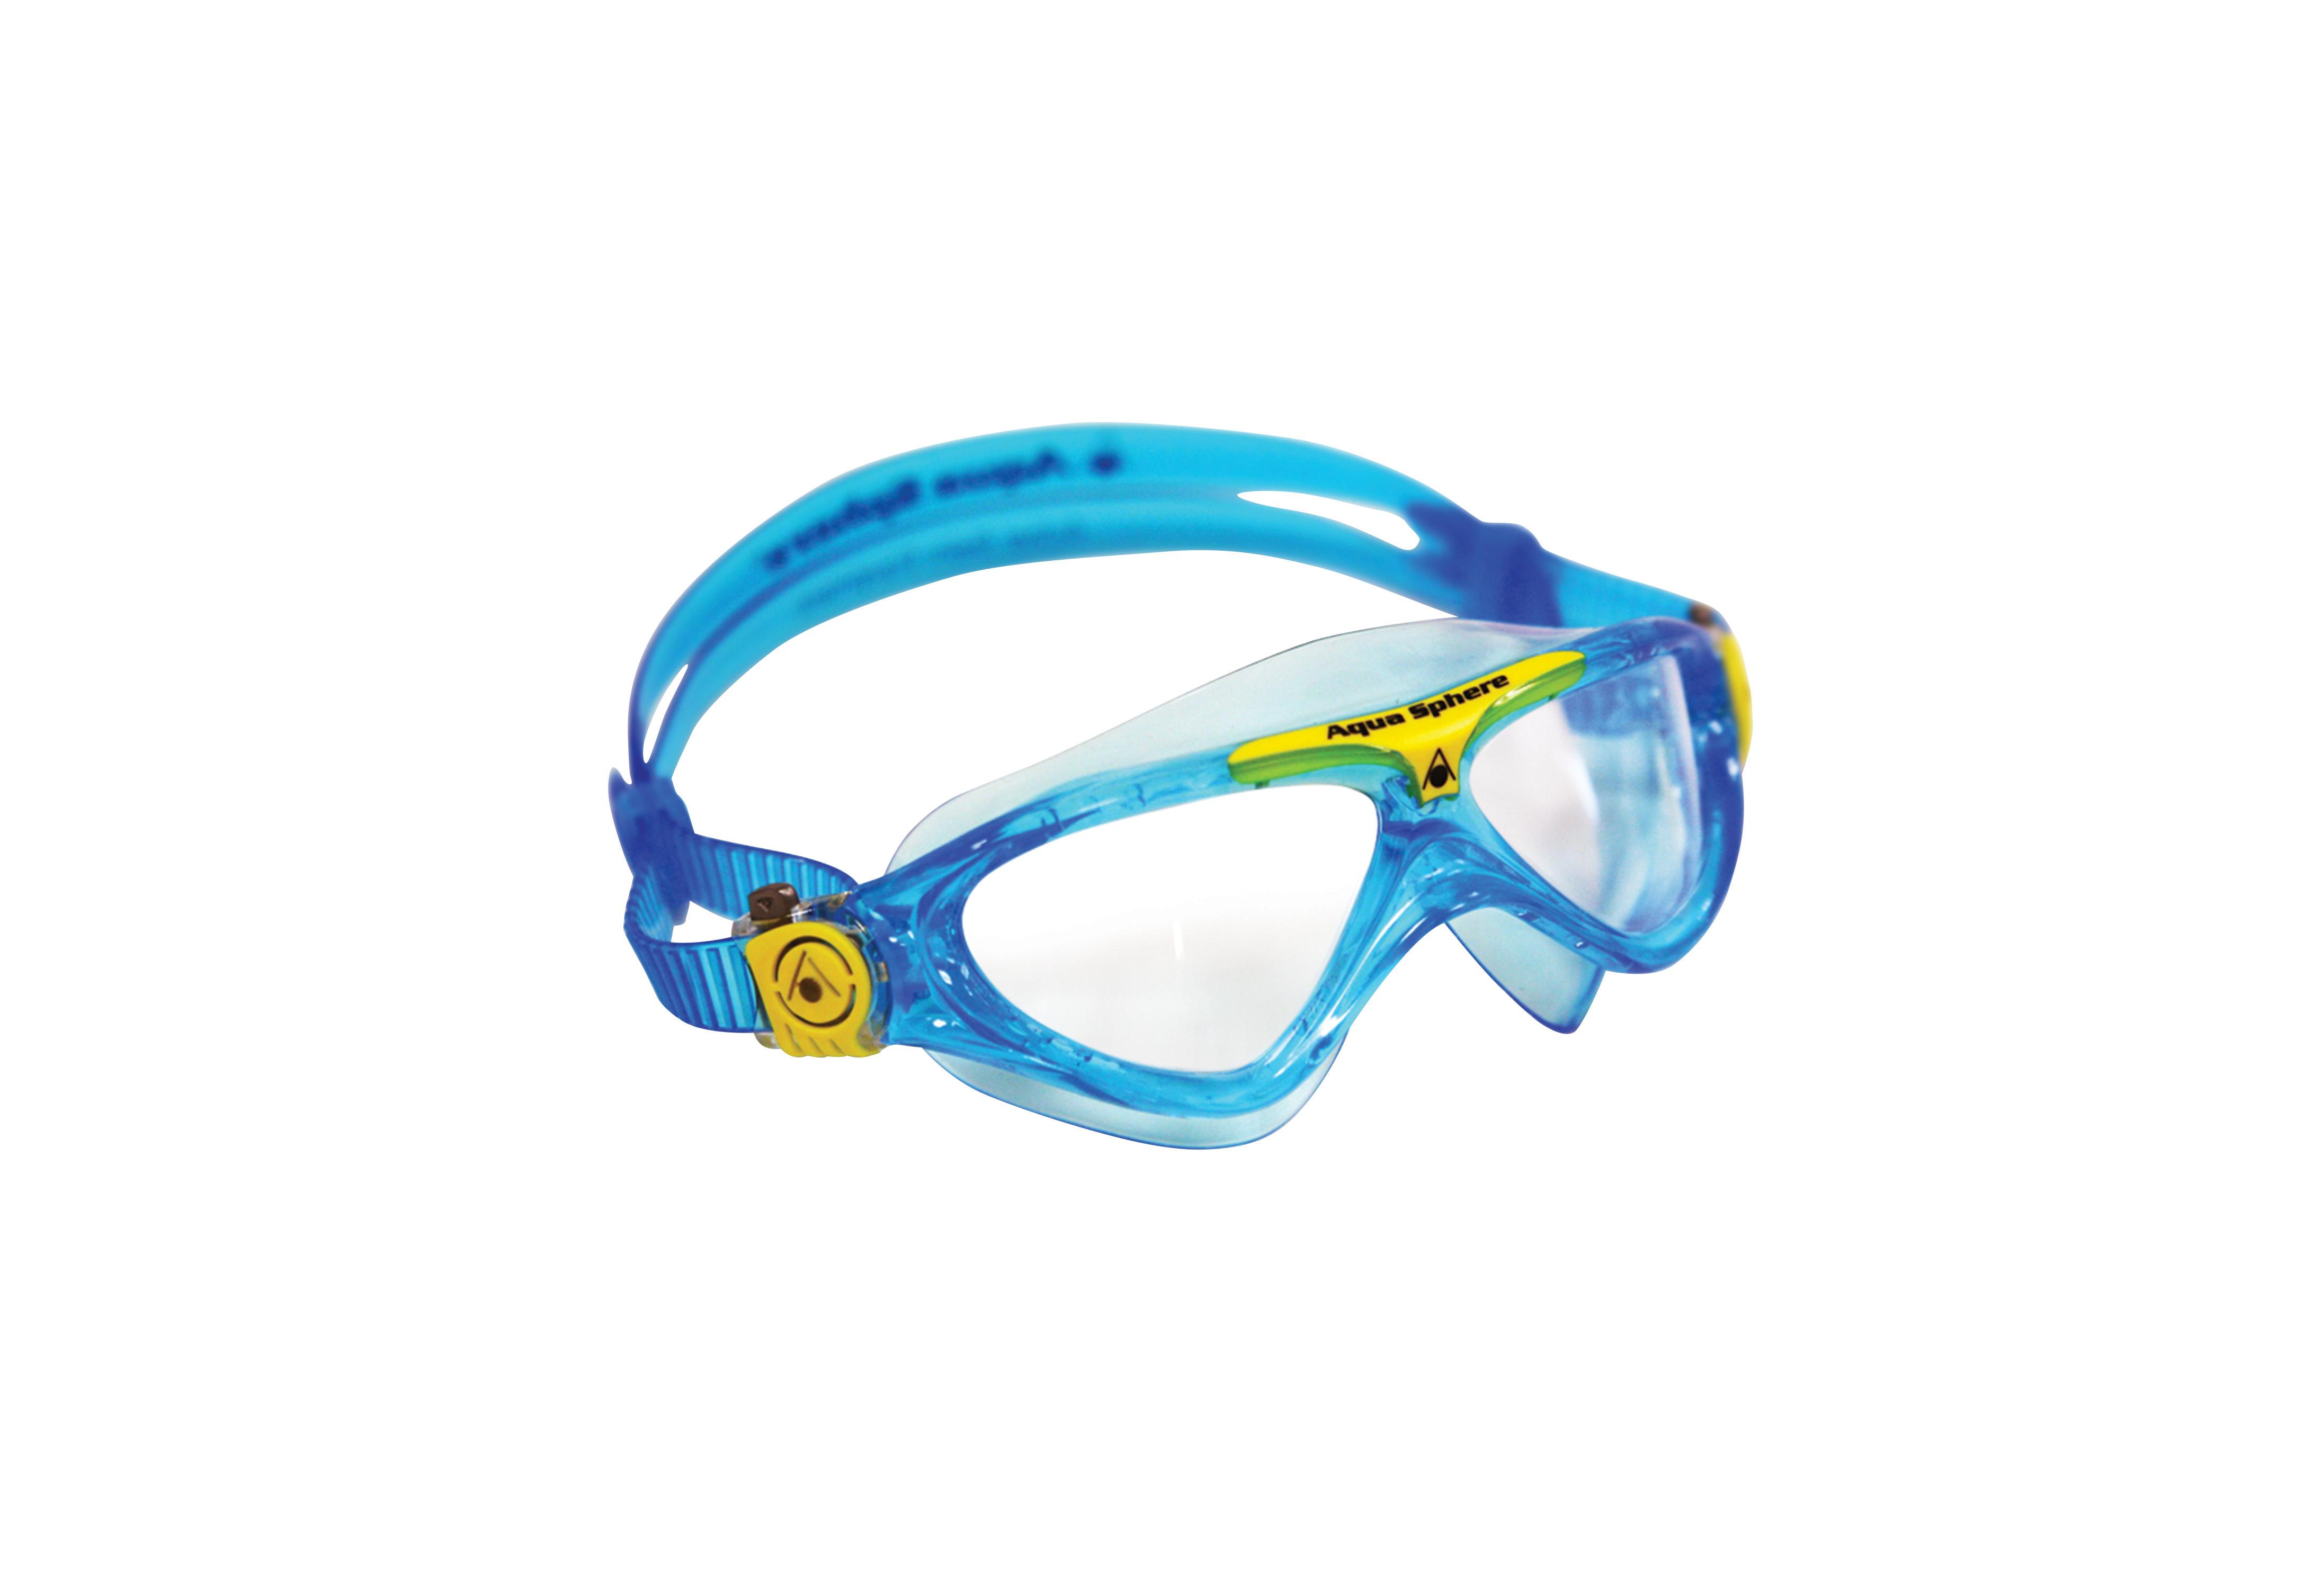 446f1342d84 AQUA SPHERE Vista Junior Triathlon Svømmebrille 4-14 år KLART AQUA ...